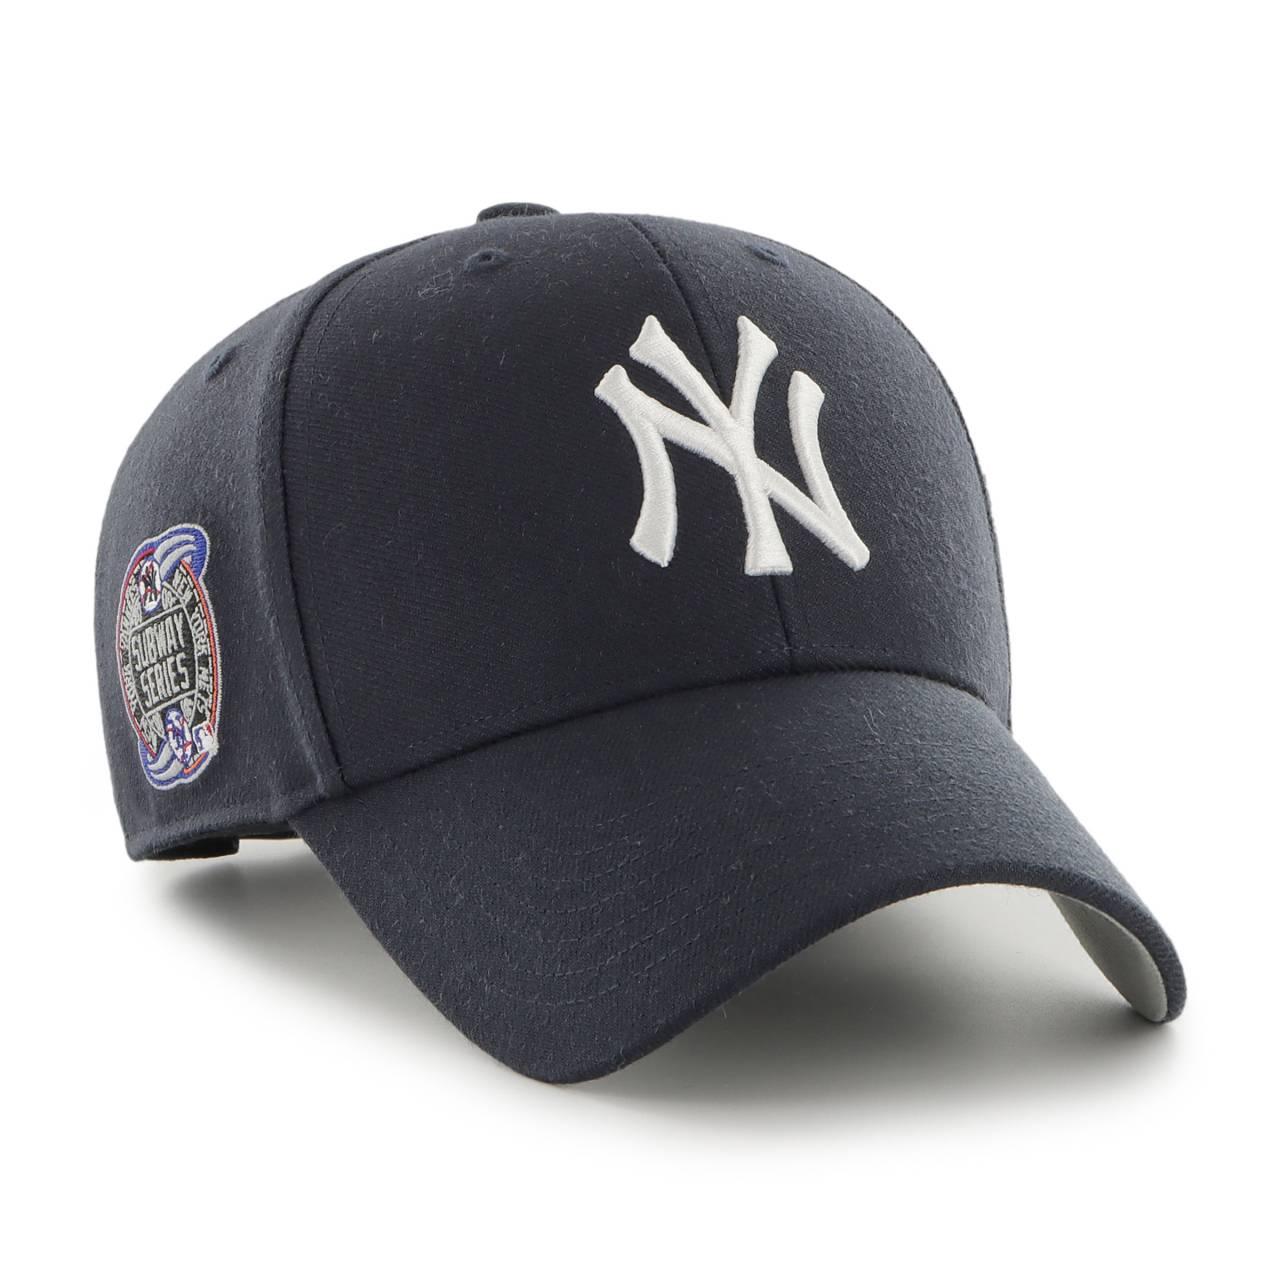 MLB NEW YORK YANKEES SURE SHOT SNAPBACK TT '47 MVP